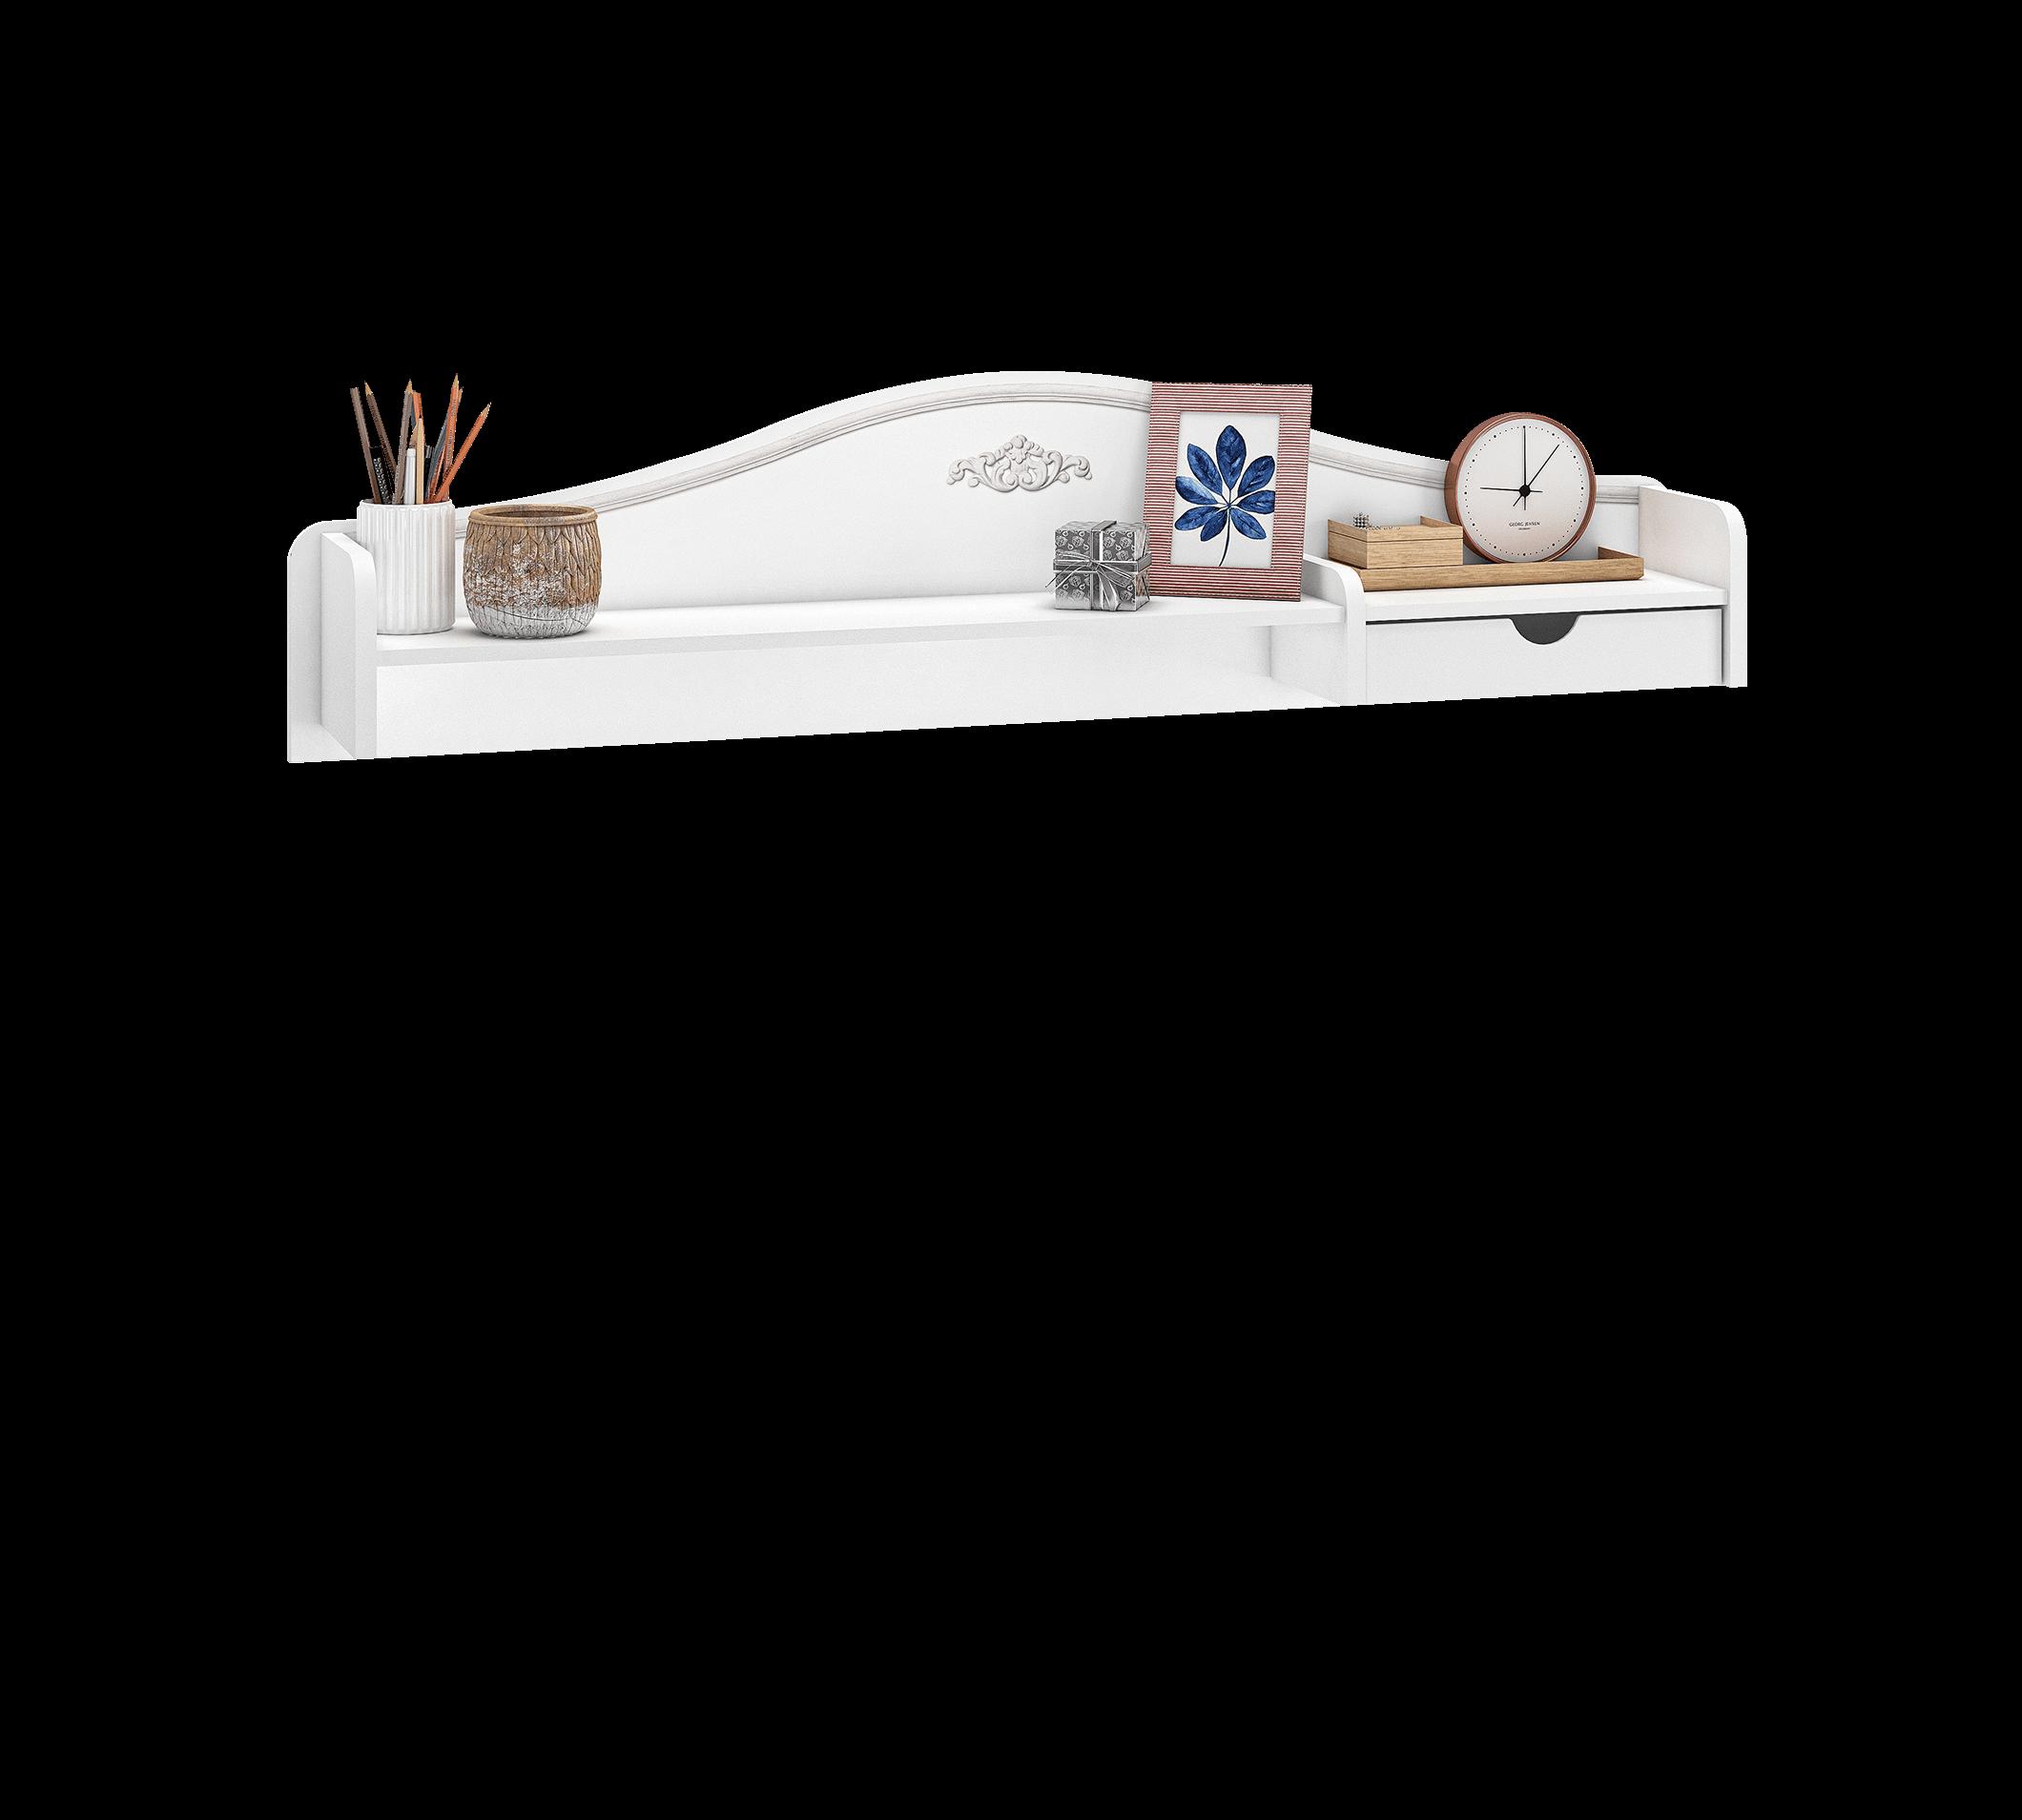 Etajera suspendata din pal, pentru tineret Selena Grey Alb / Gri, l120xA18xH33 cm